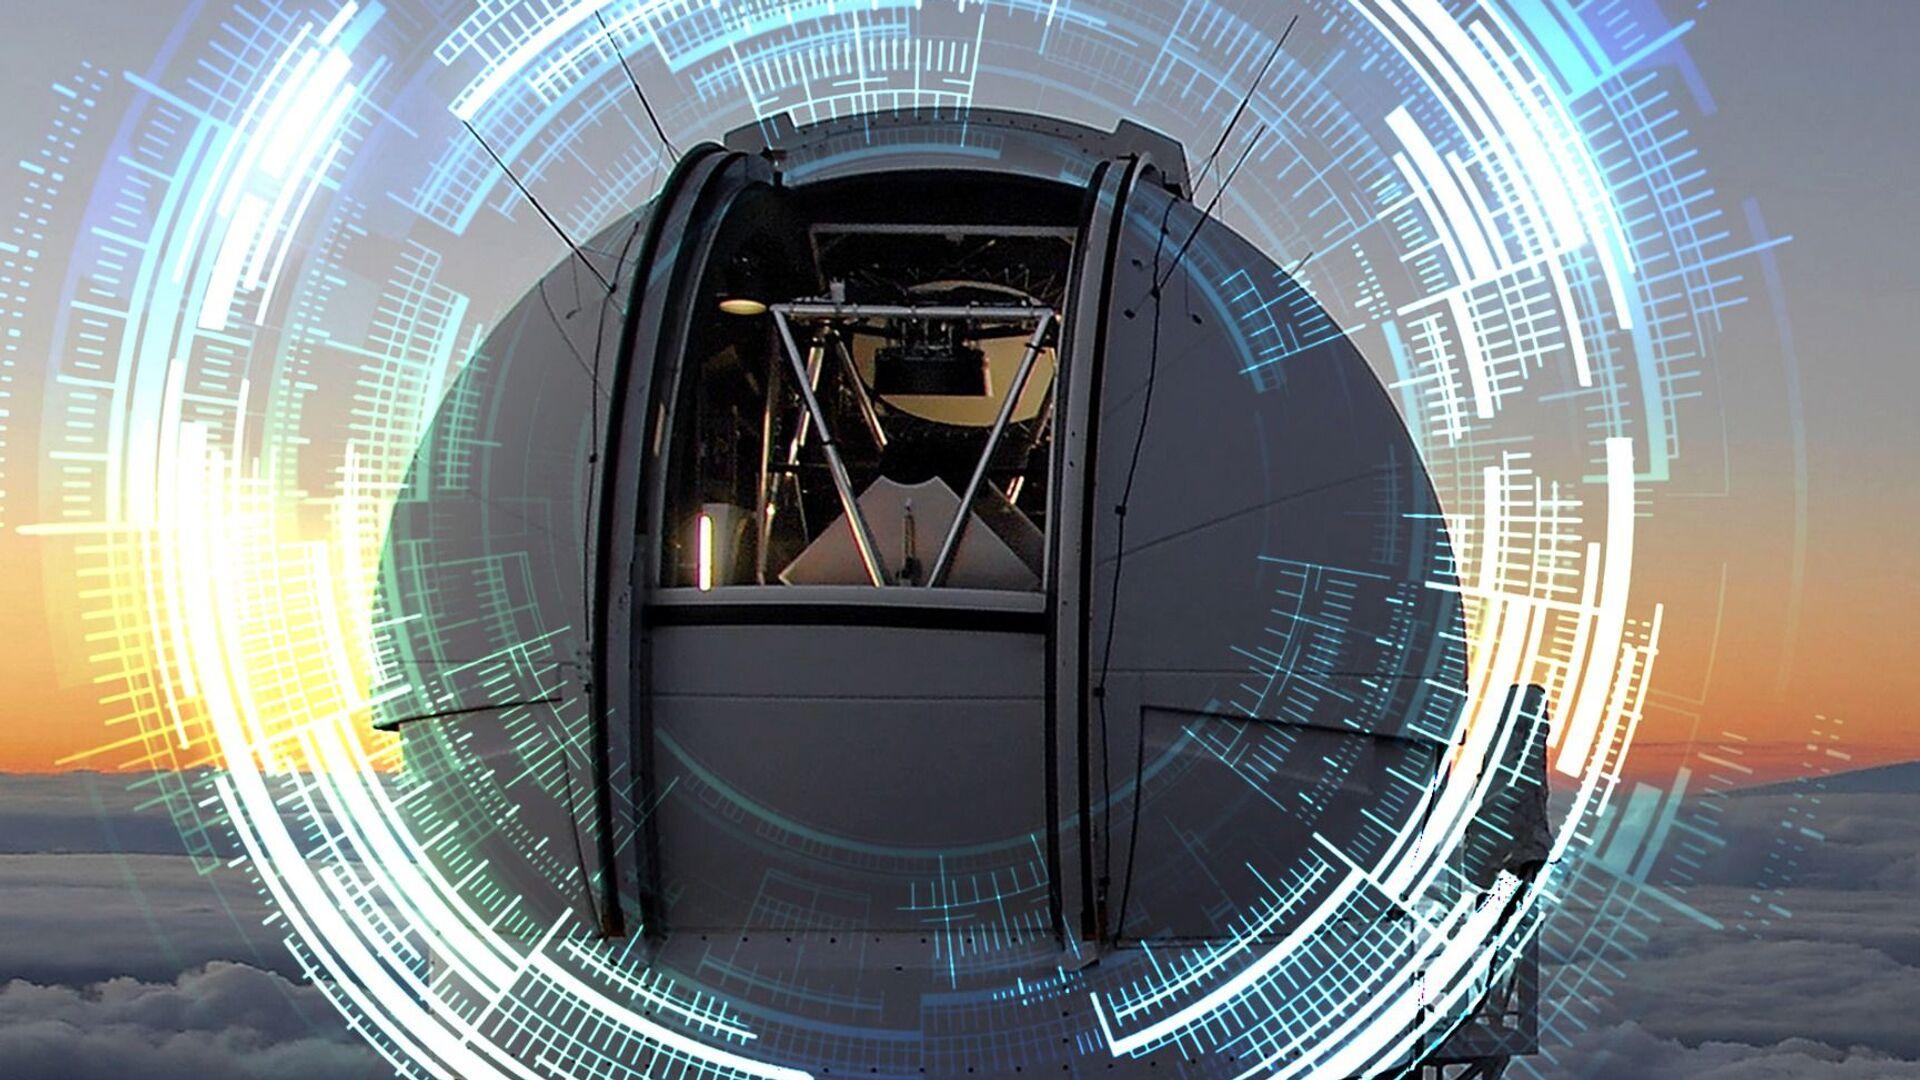 Observatorio astrónomico - Sputnik Mundo, 1920, 04.08.2021